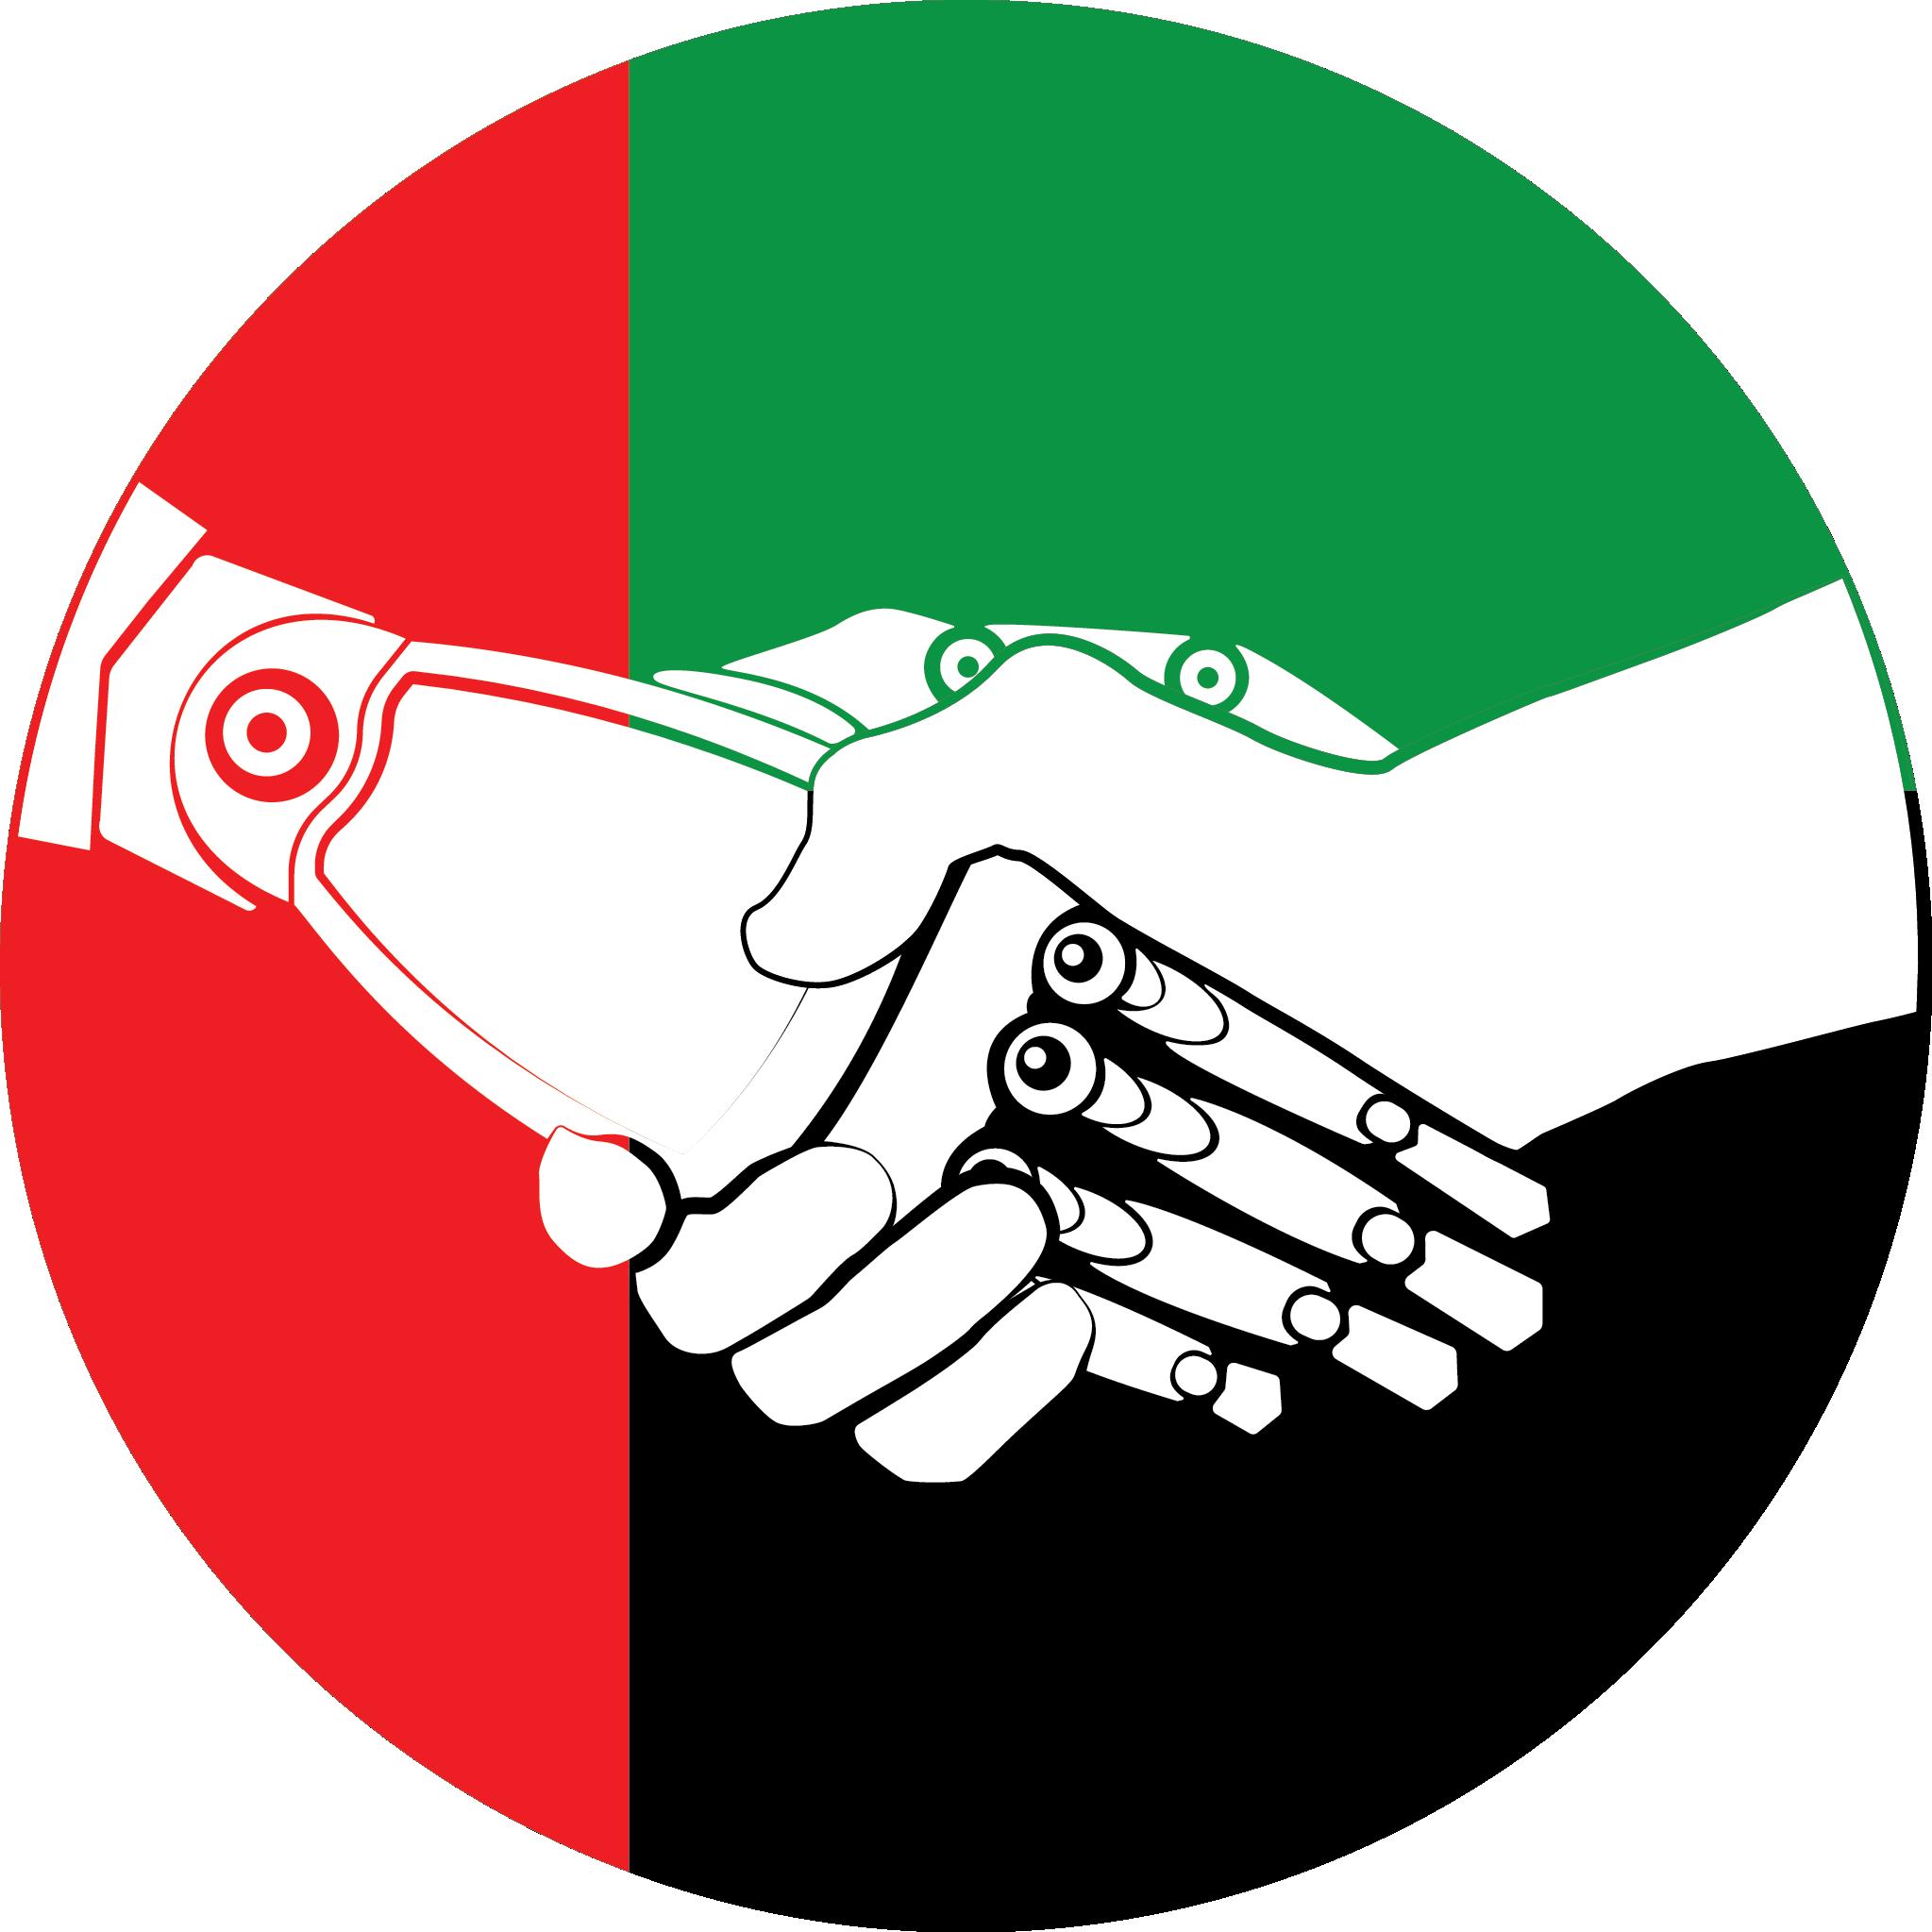 huge freebie download. Handshake clipart introduction